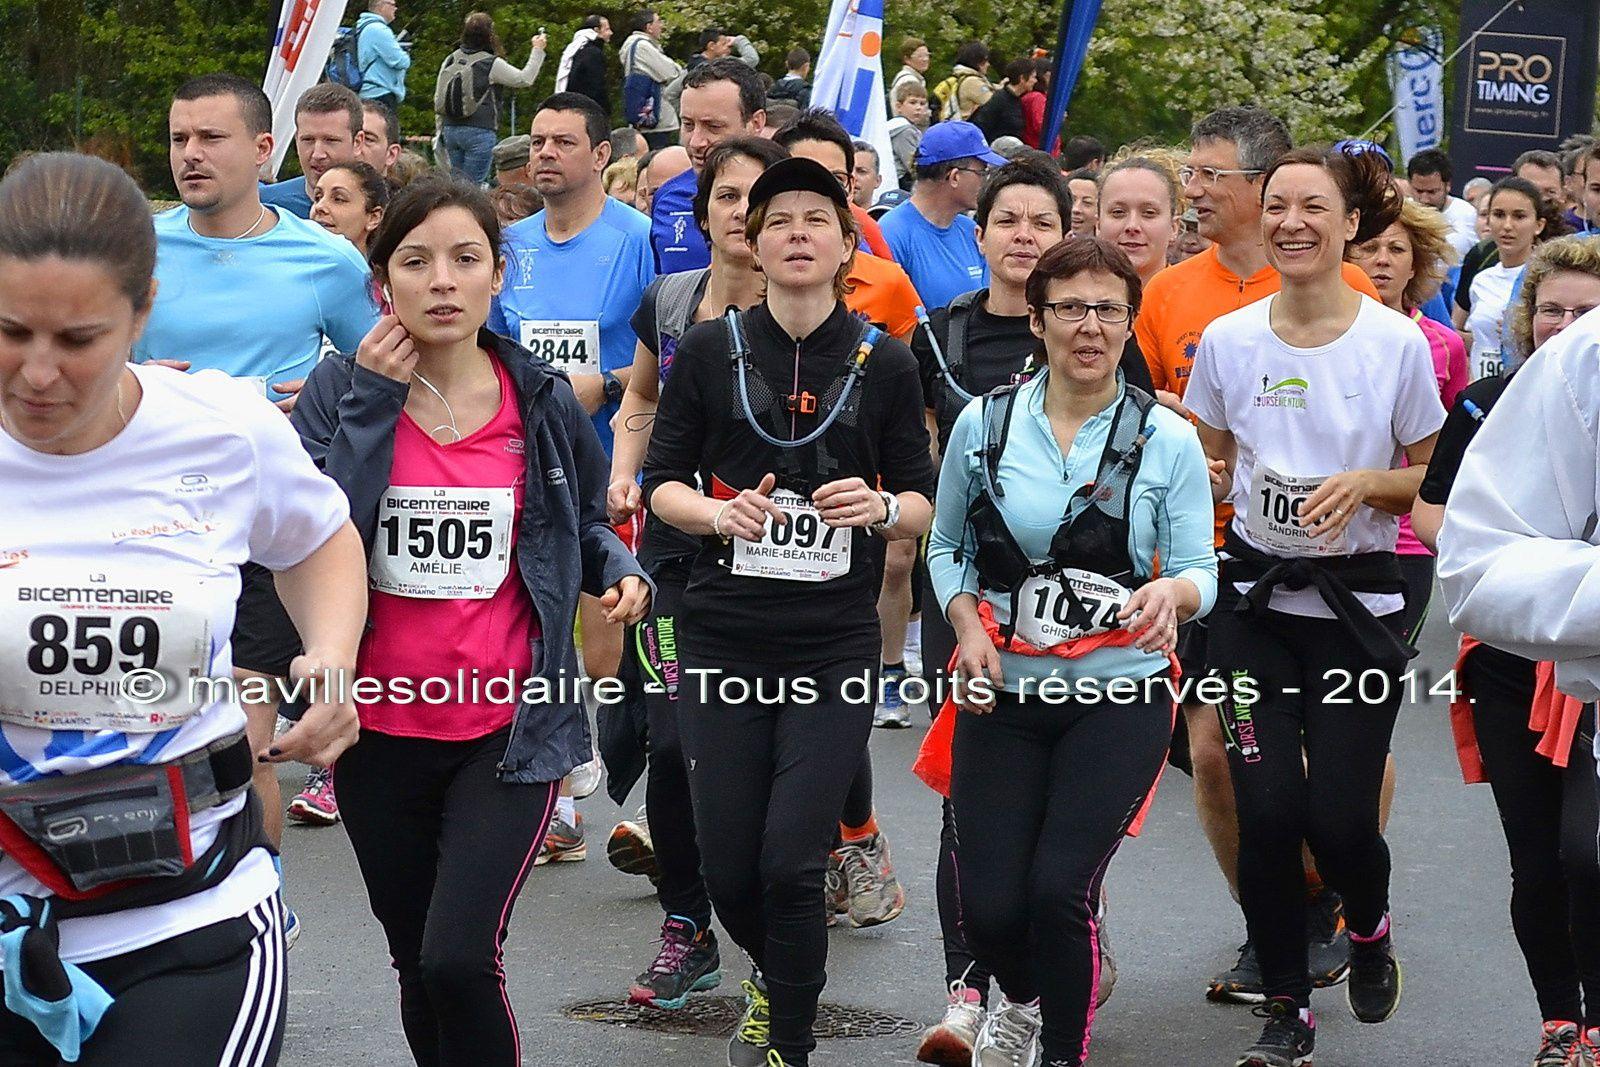 La bicentenaire 2014 - La Roche-sur-Yon.